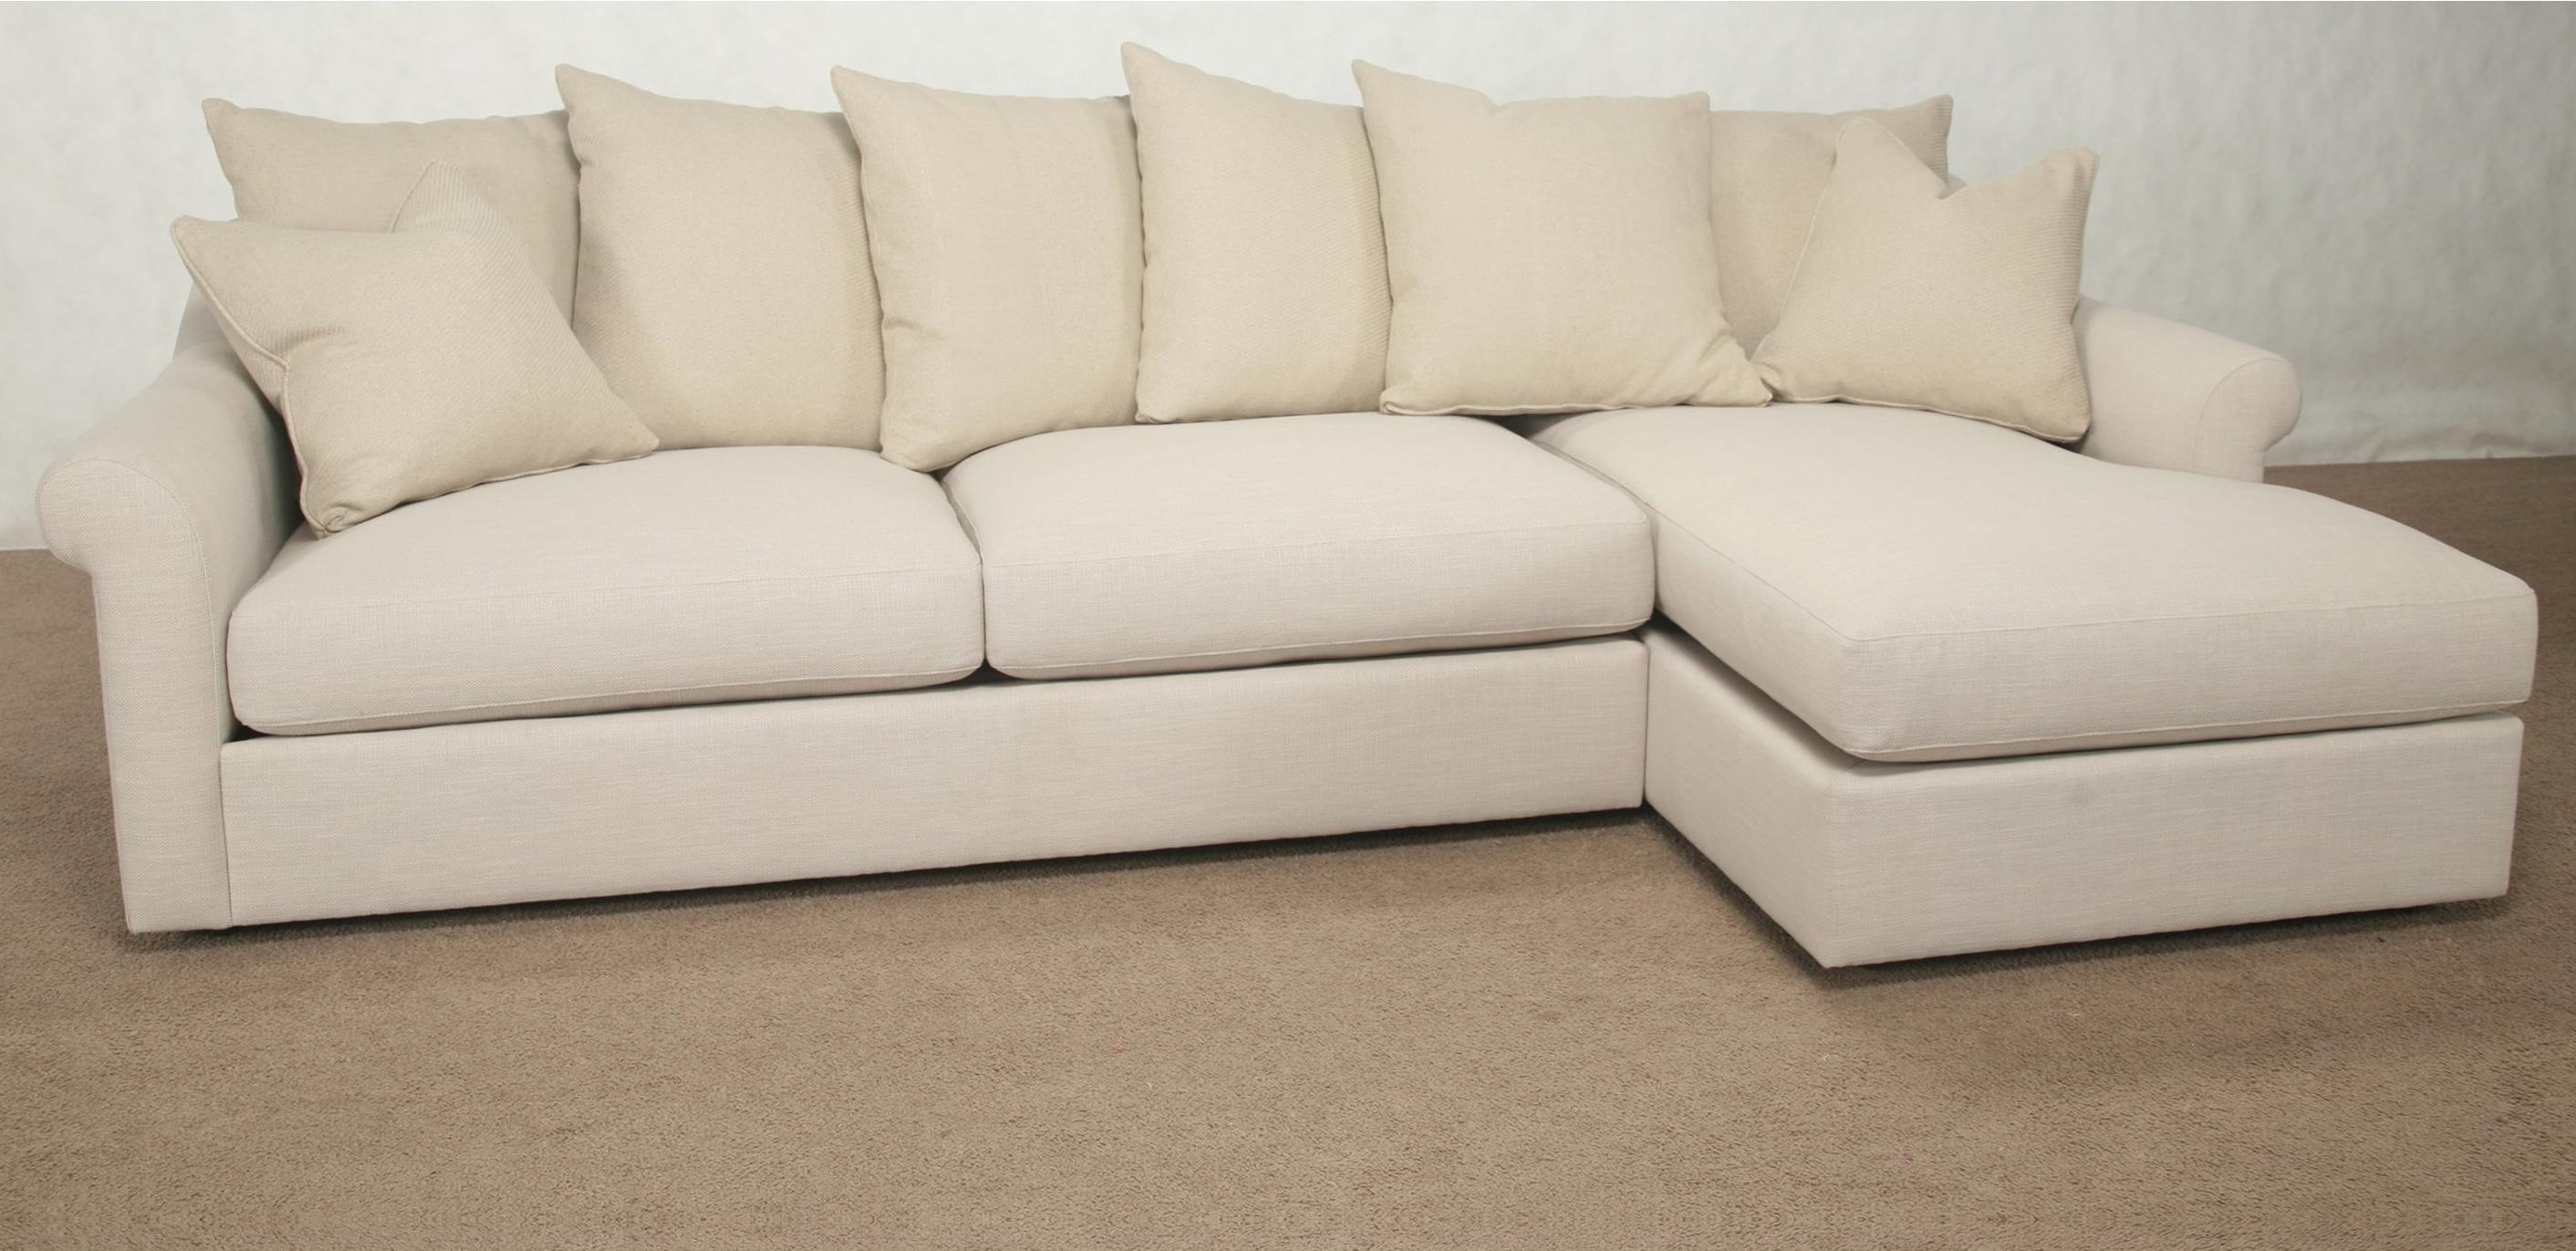 bauhaus sectional sofa sofasectional sofas microfiber. Black Bedroom Furniture Sets. Home Design Ideas